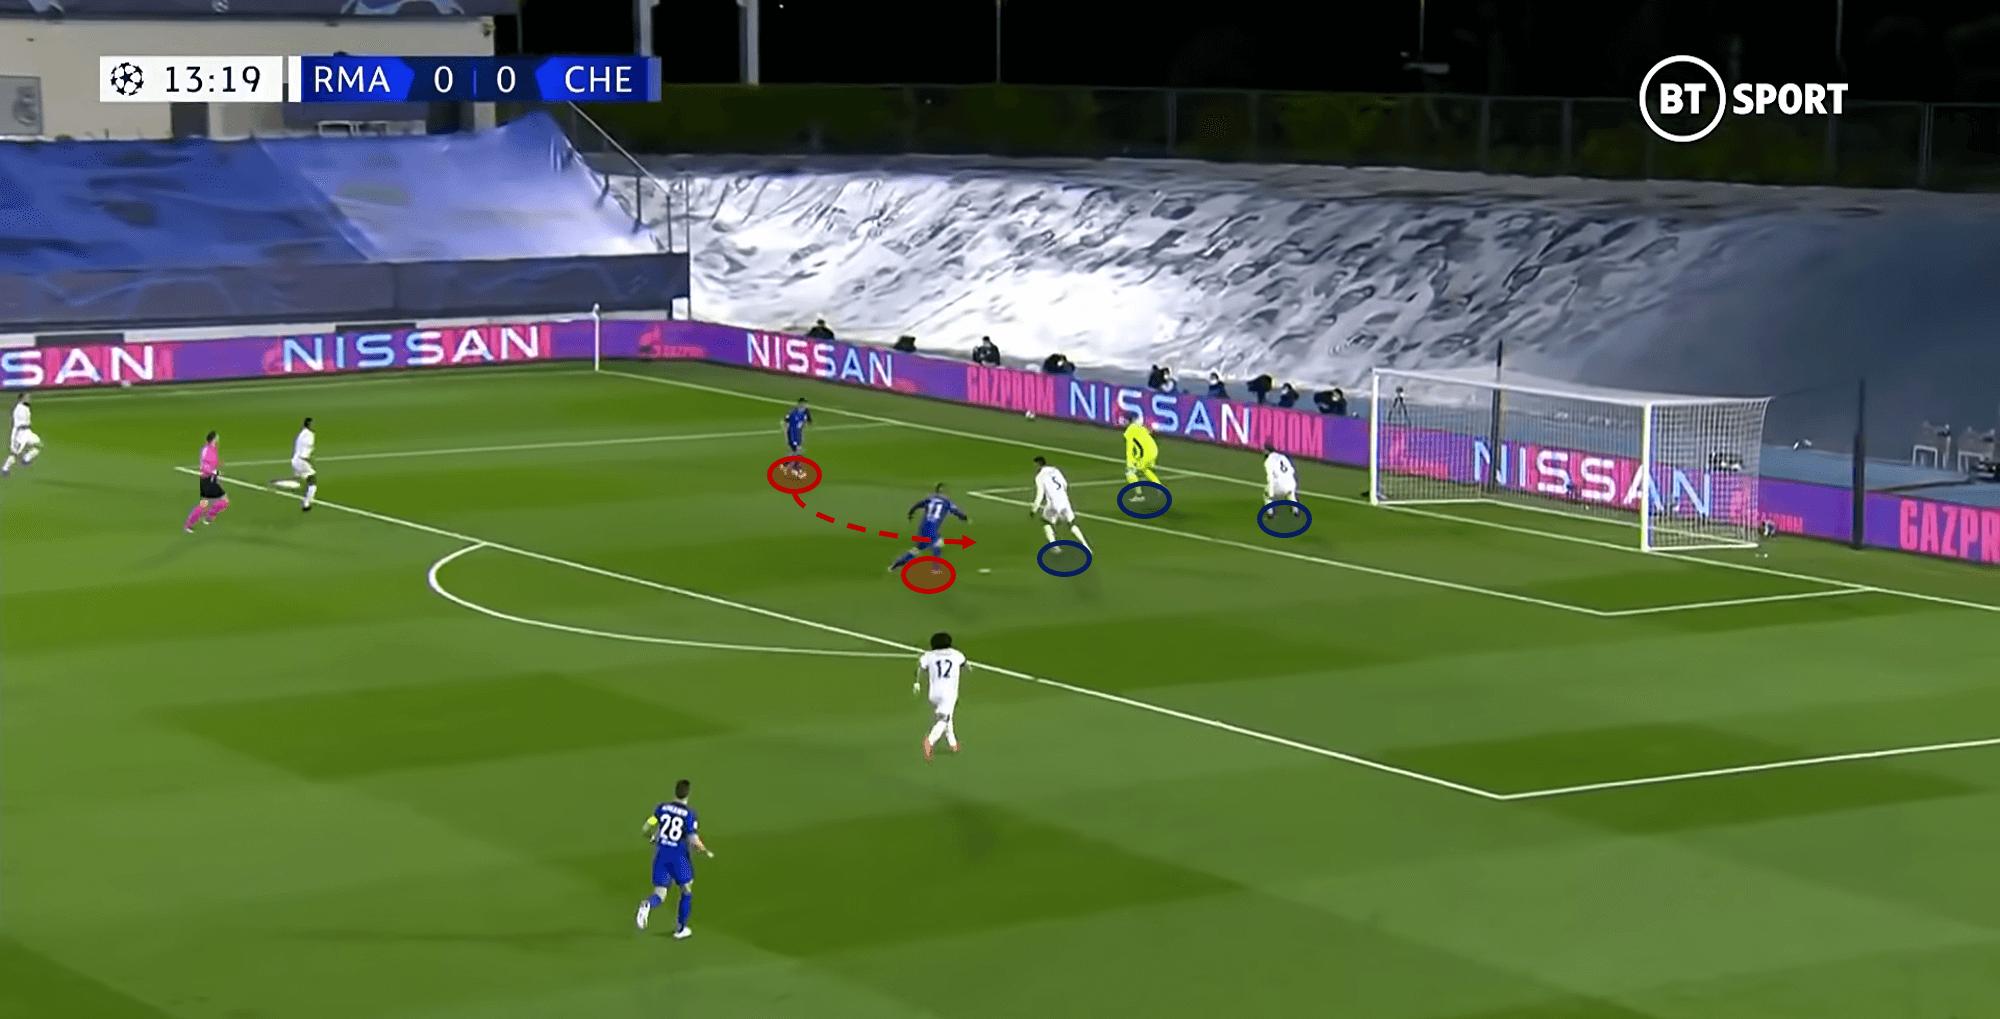 UEFA Champions League 2020/21: Real Madrid vs Chelsea - tactical analysis tactics